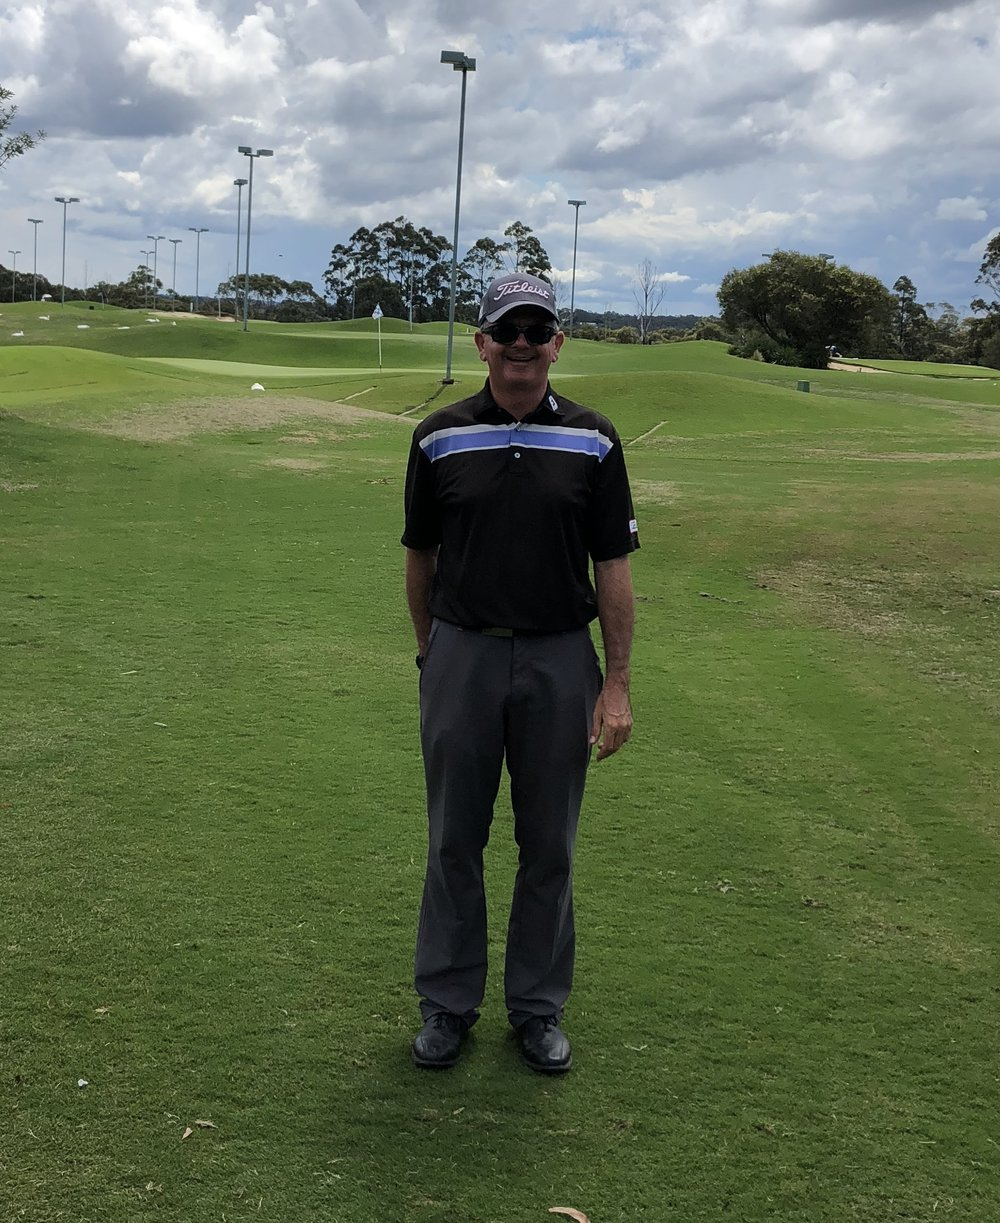 Simon Deep On The Tee Travel Golf School.jpg